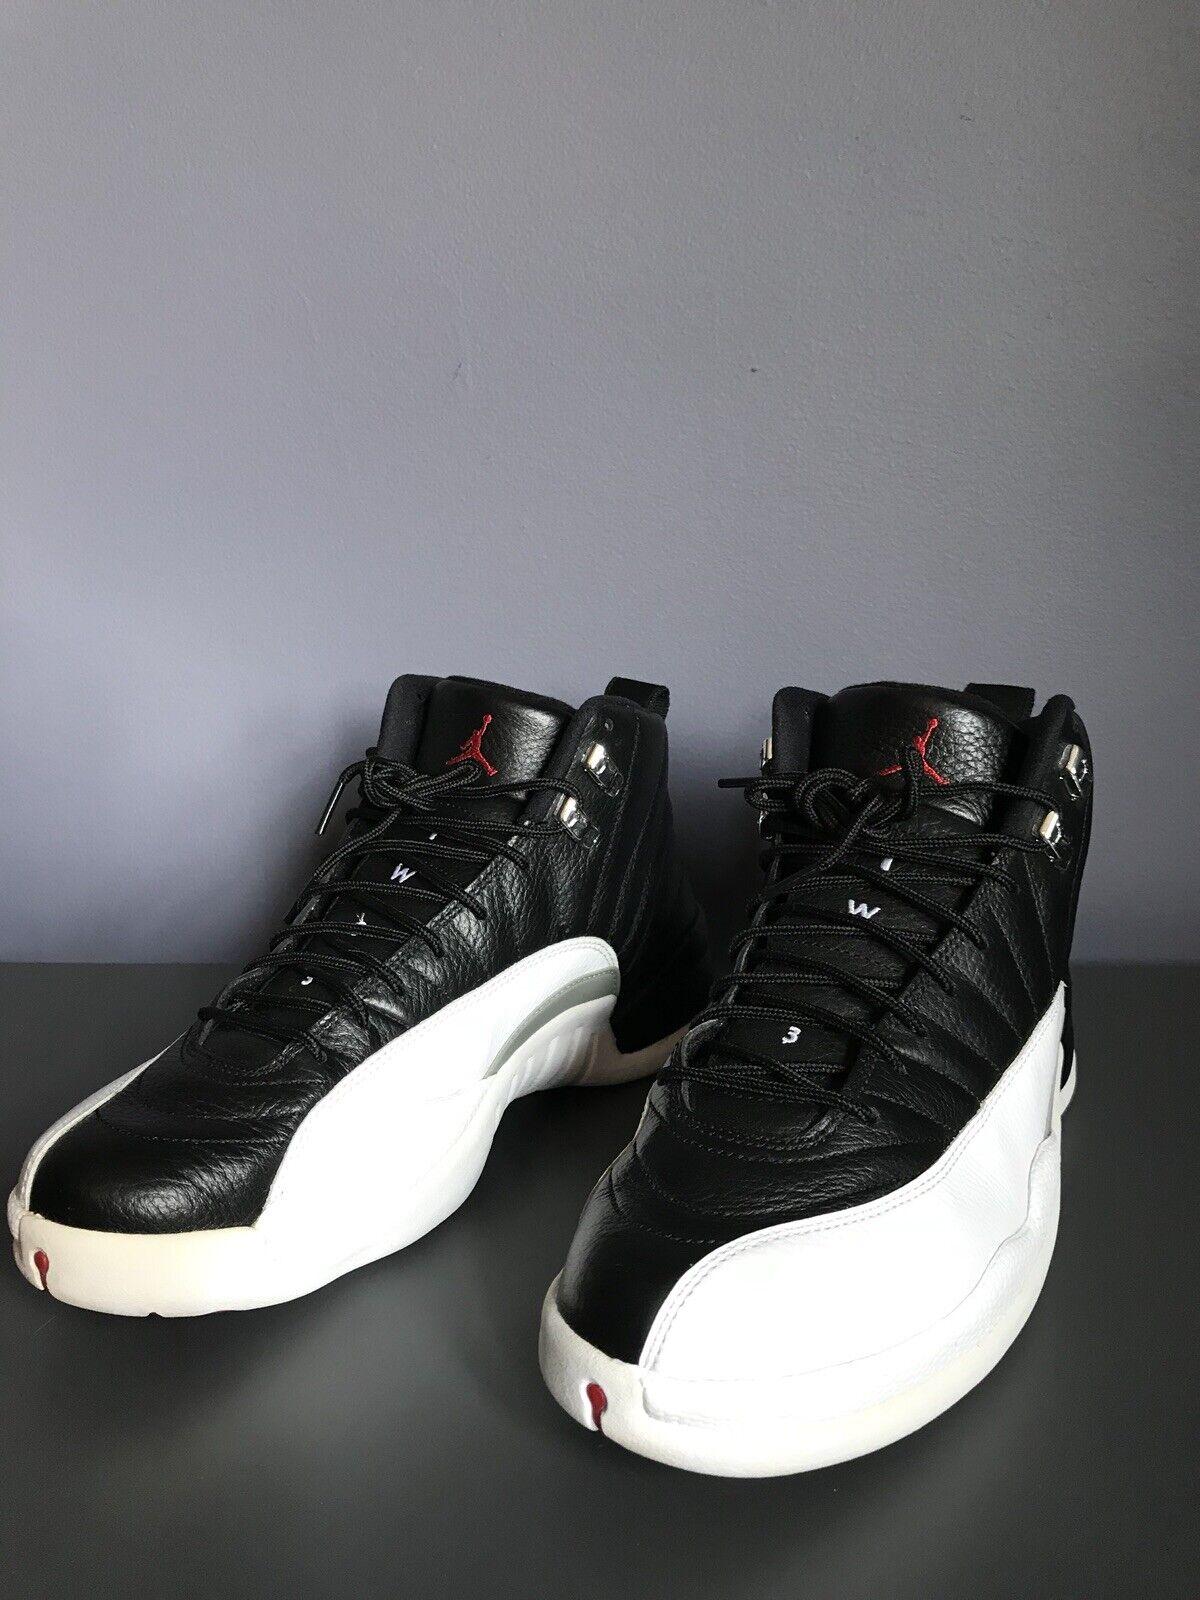 Jordan 12 XII Nike Air Playoff liberación Varsity Rojo